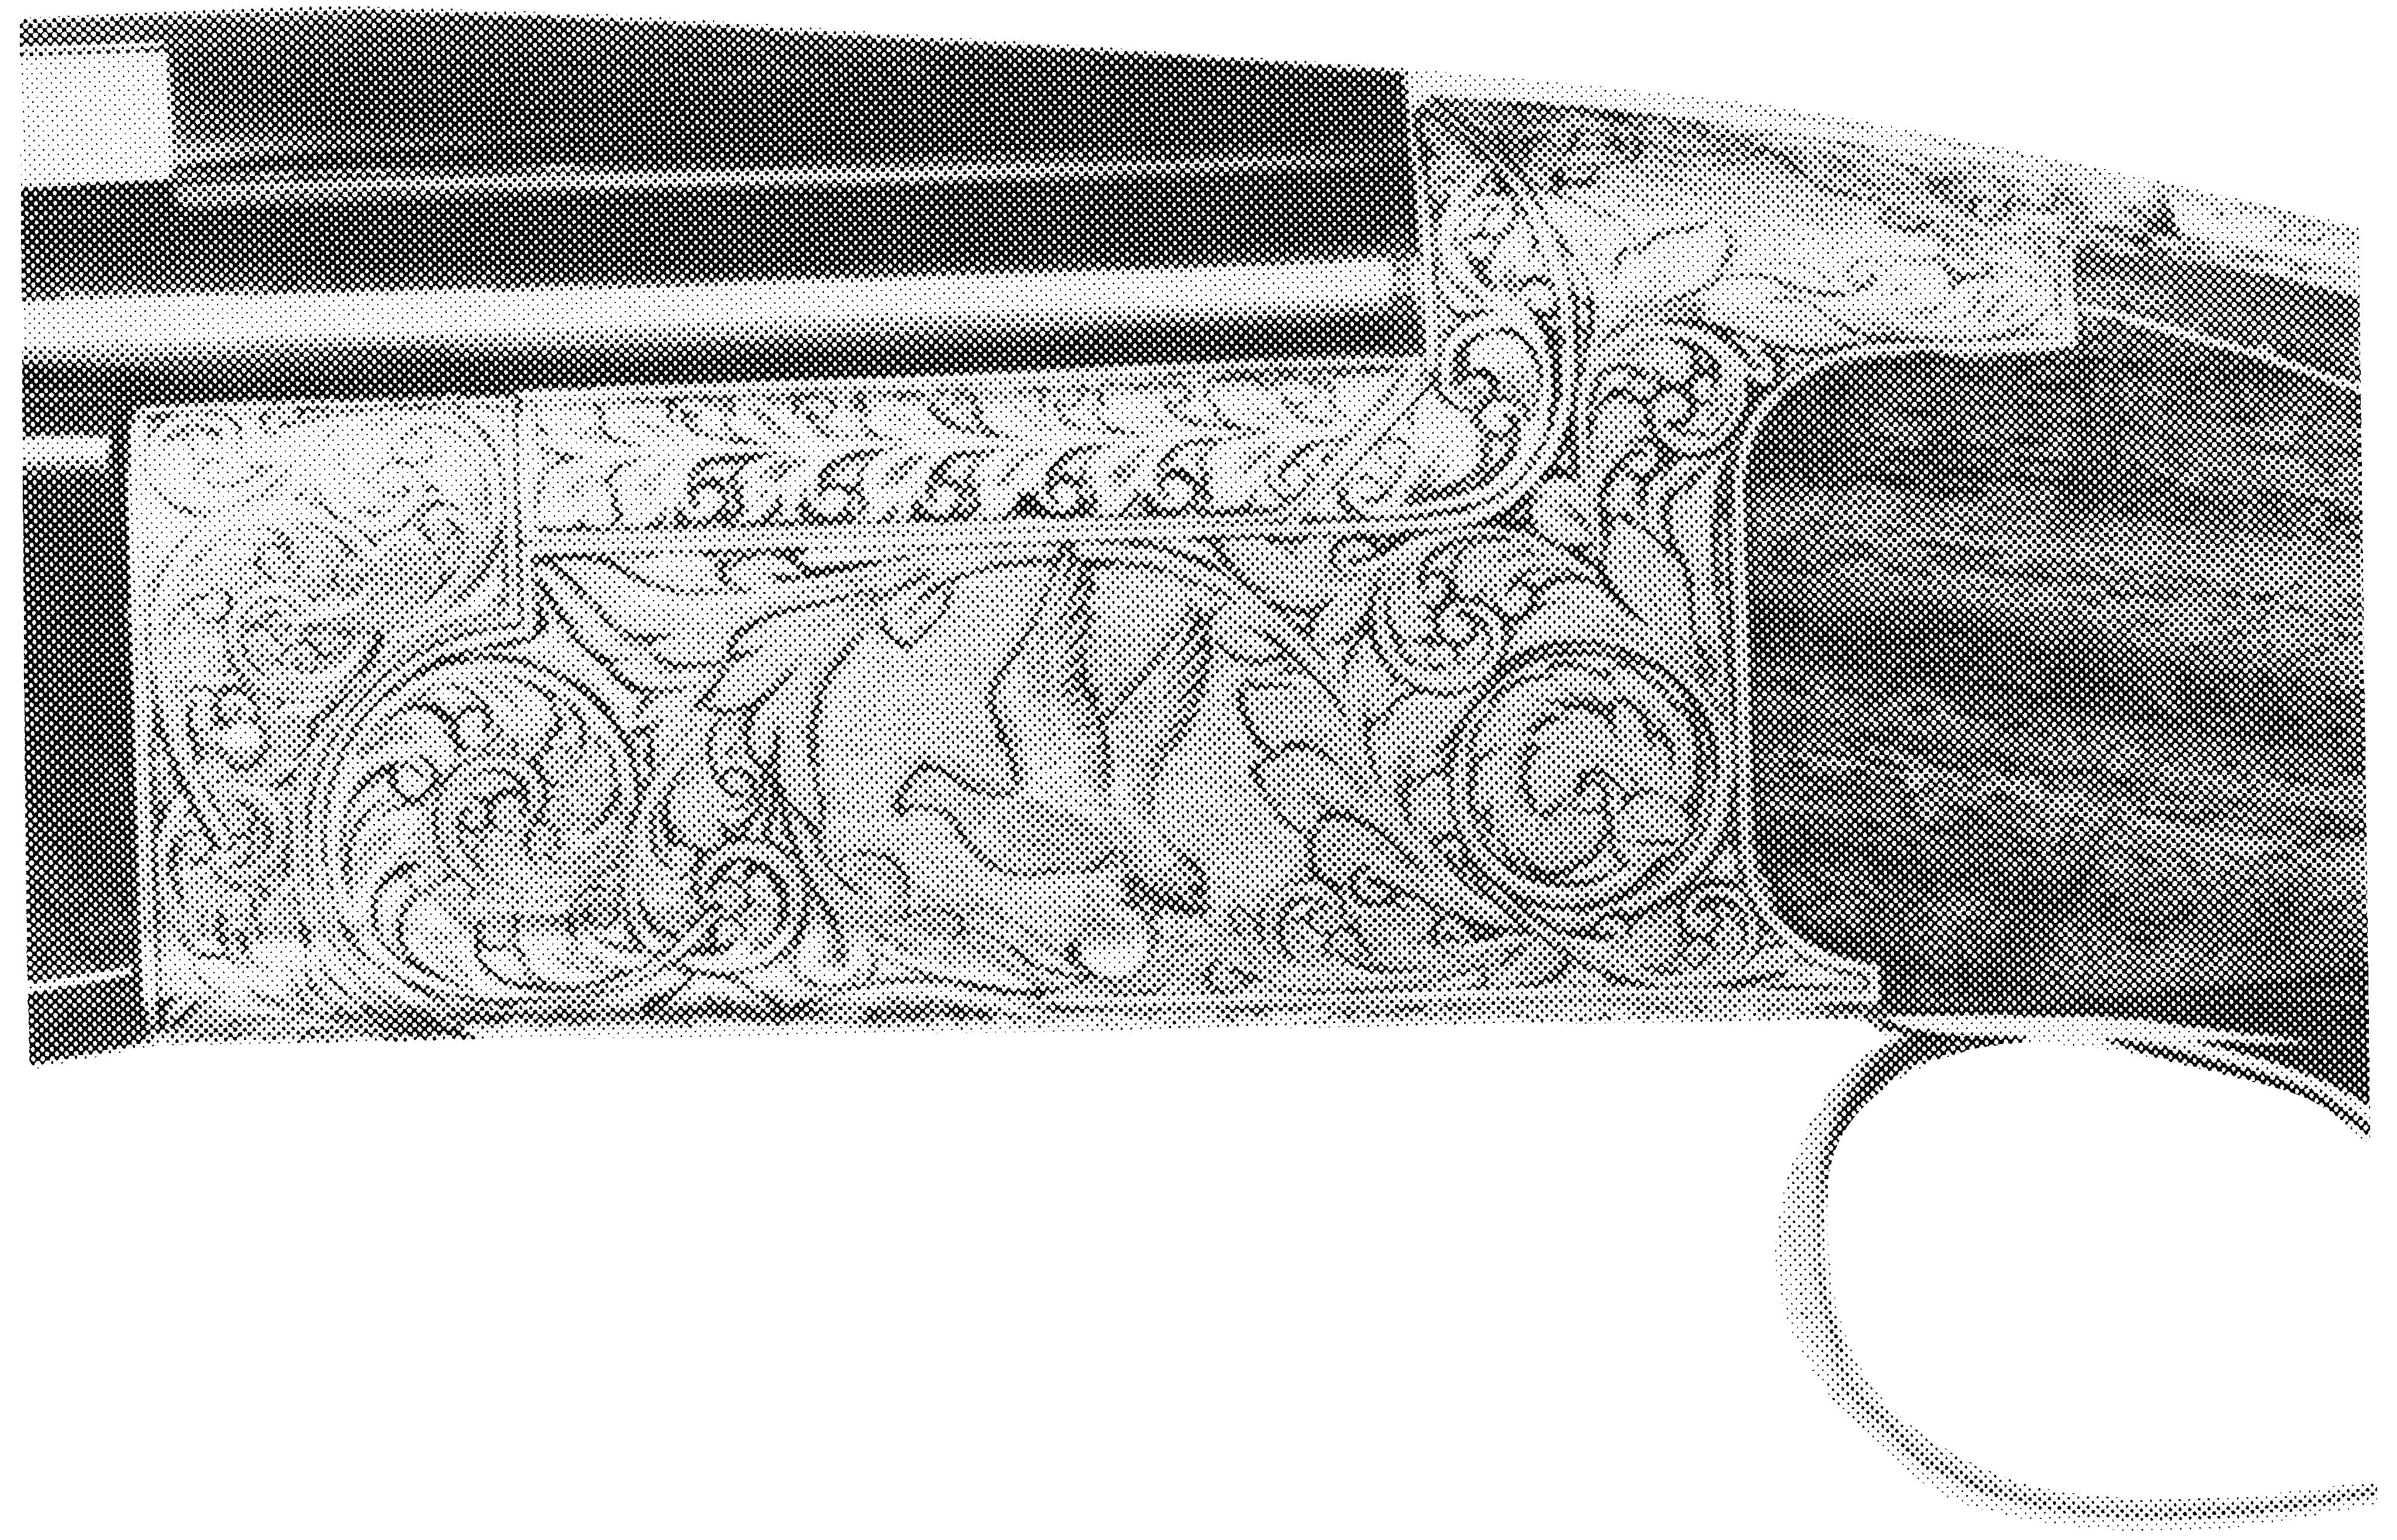 BT-99 Plus—Pigeon Grade